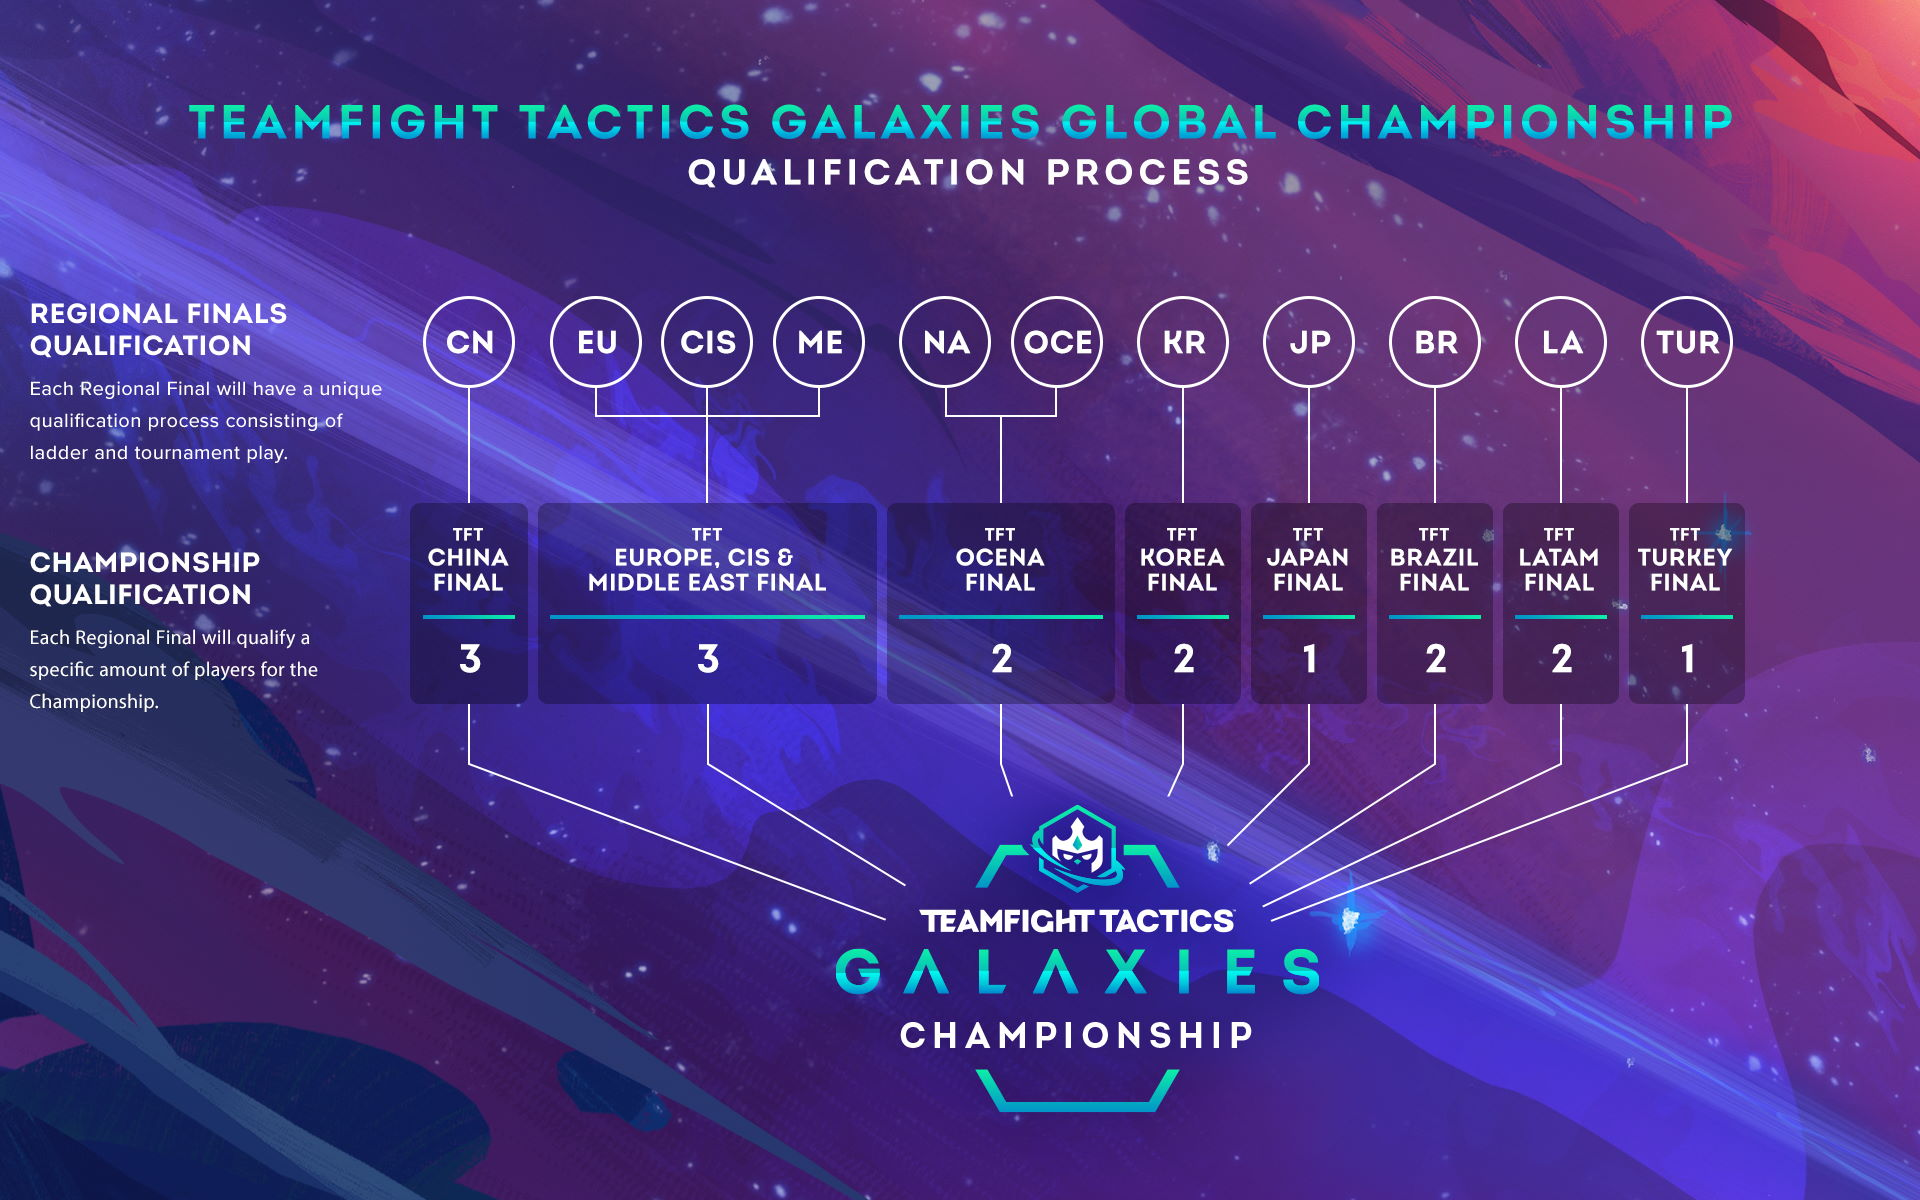 Teamfight Tactics Galaxies Global Championship